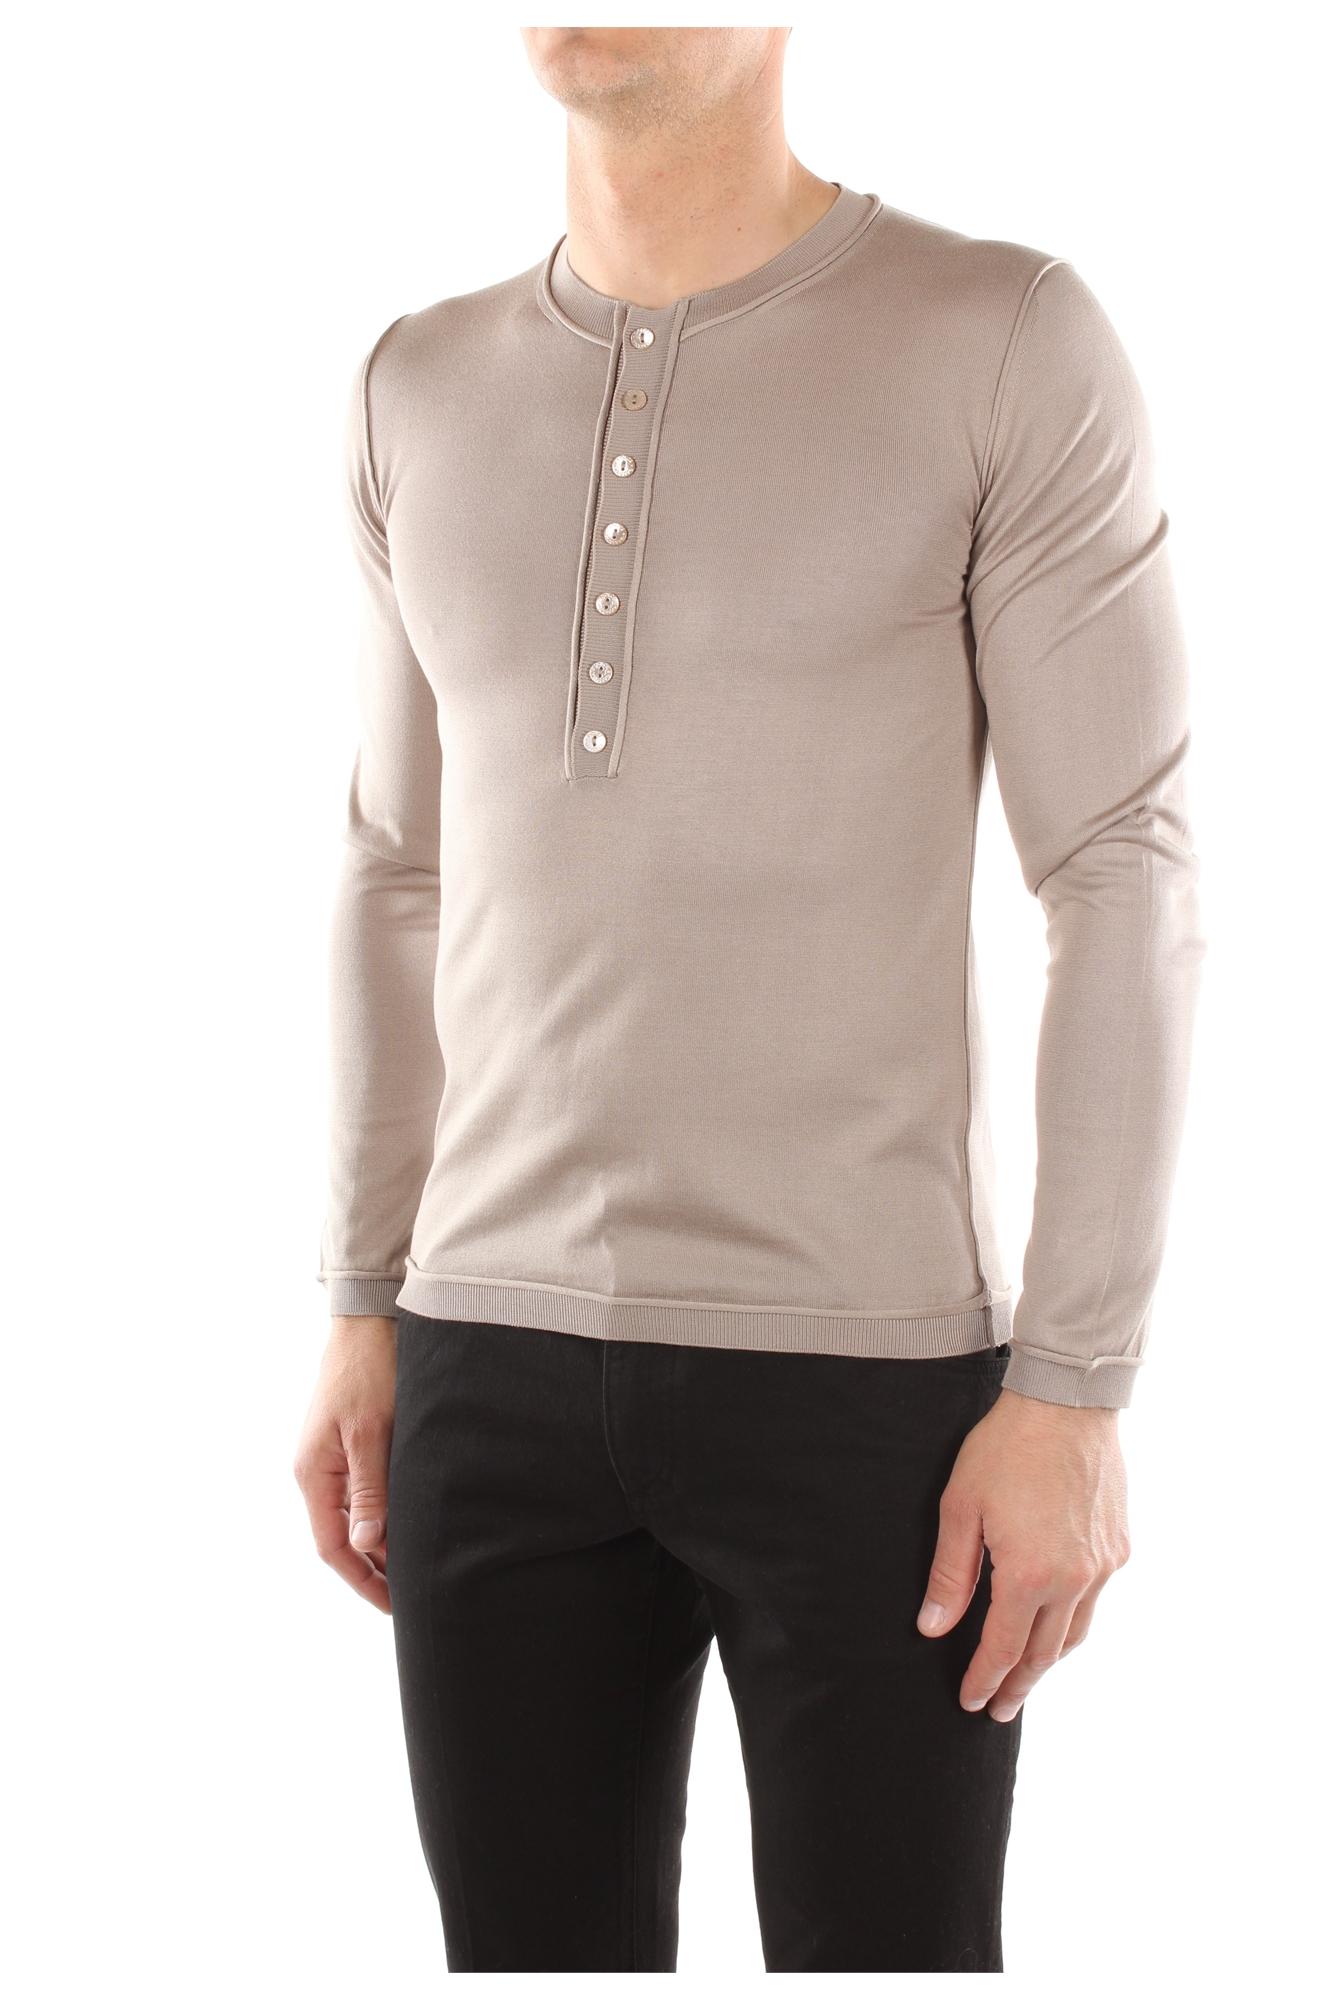 sweatshirts dolce gabbana herren seide grau. Black Bedroom Furniture Sets. Home Design Ideas